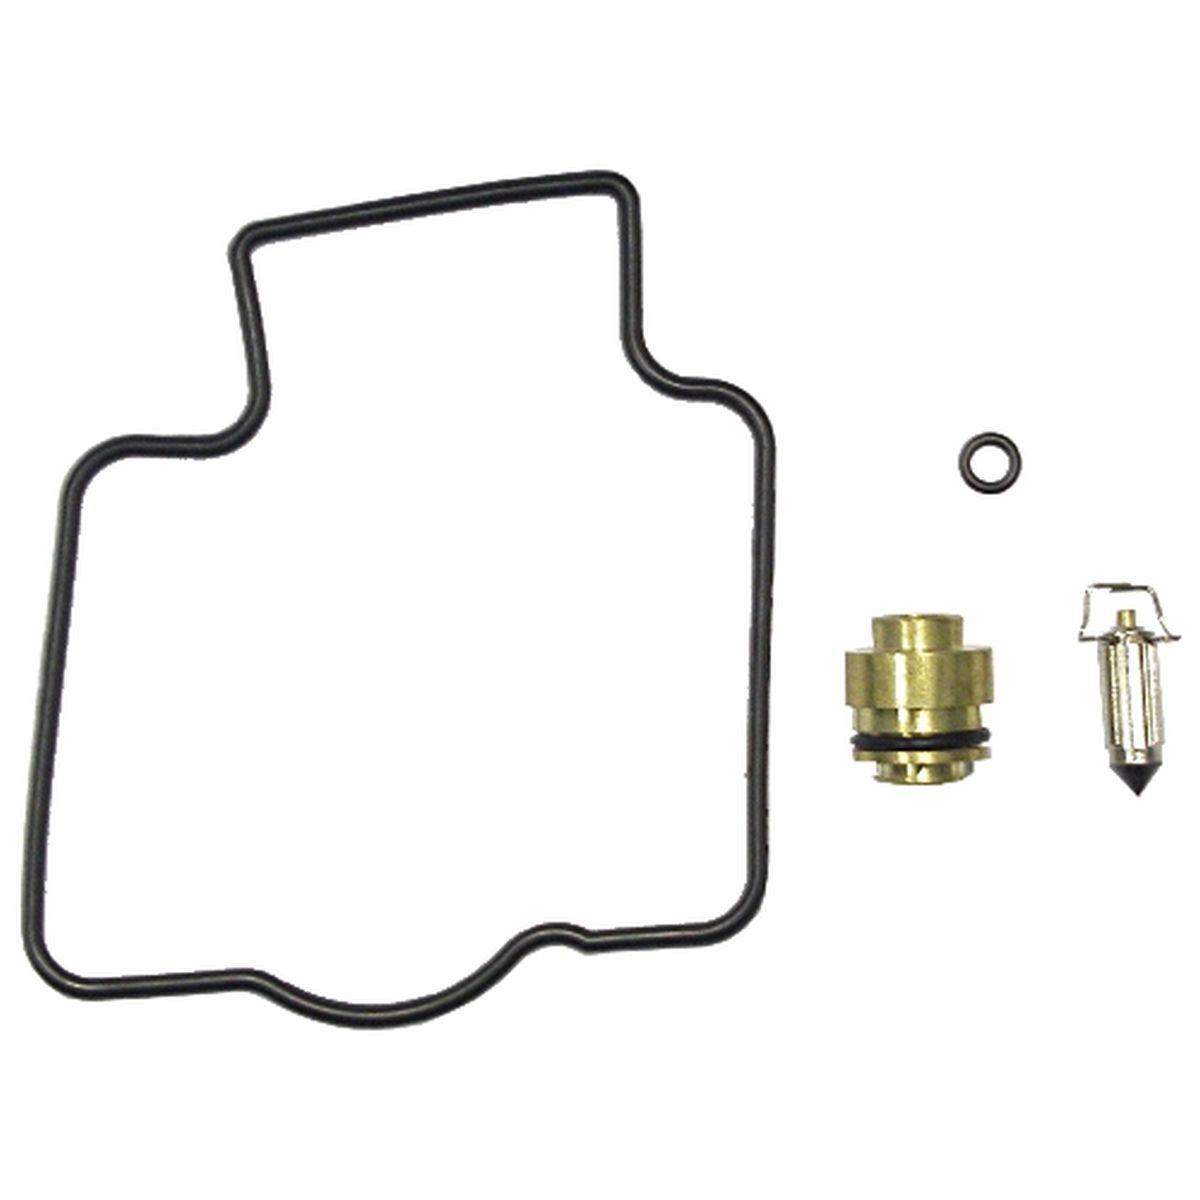 Carb Repair Kit For Kawasaki Zx 9r Zx900b3